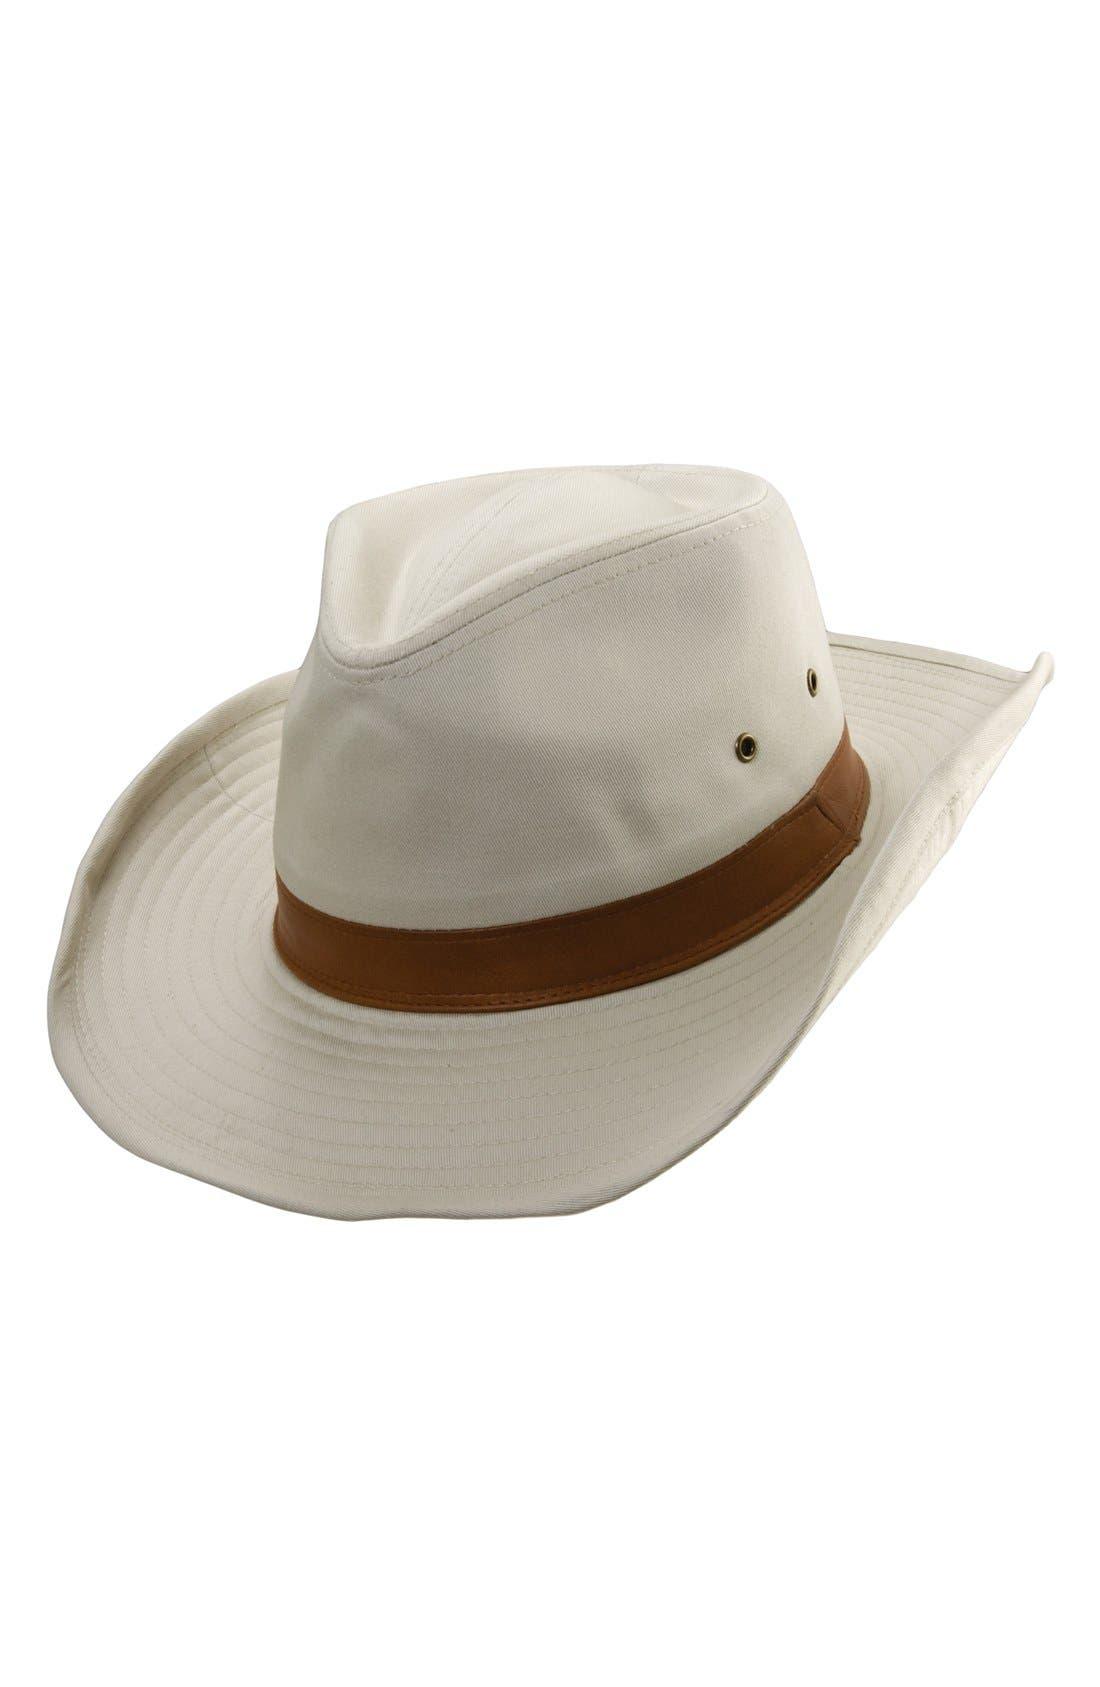 Cotton Outback Hat,                             Main thumbnail 1, color,                             231